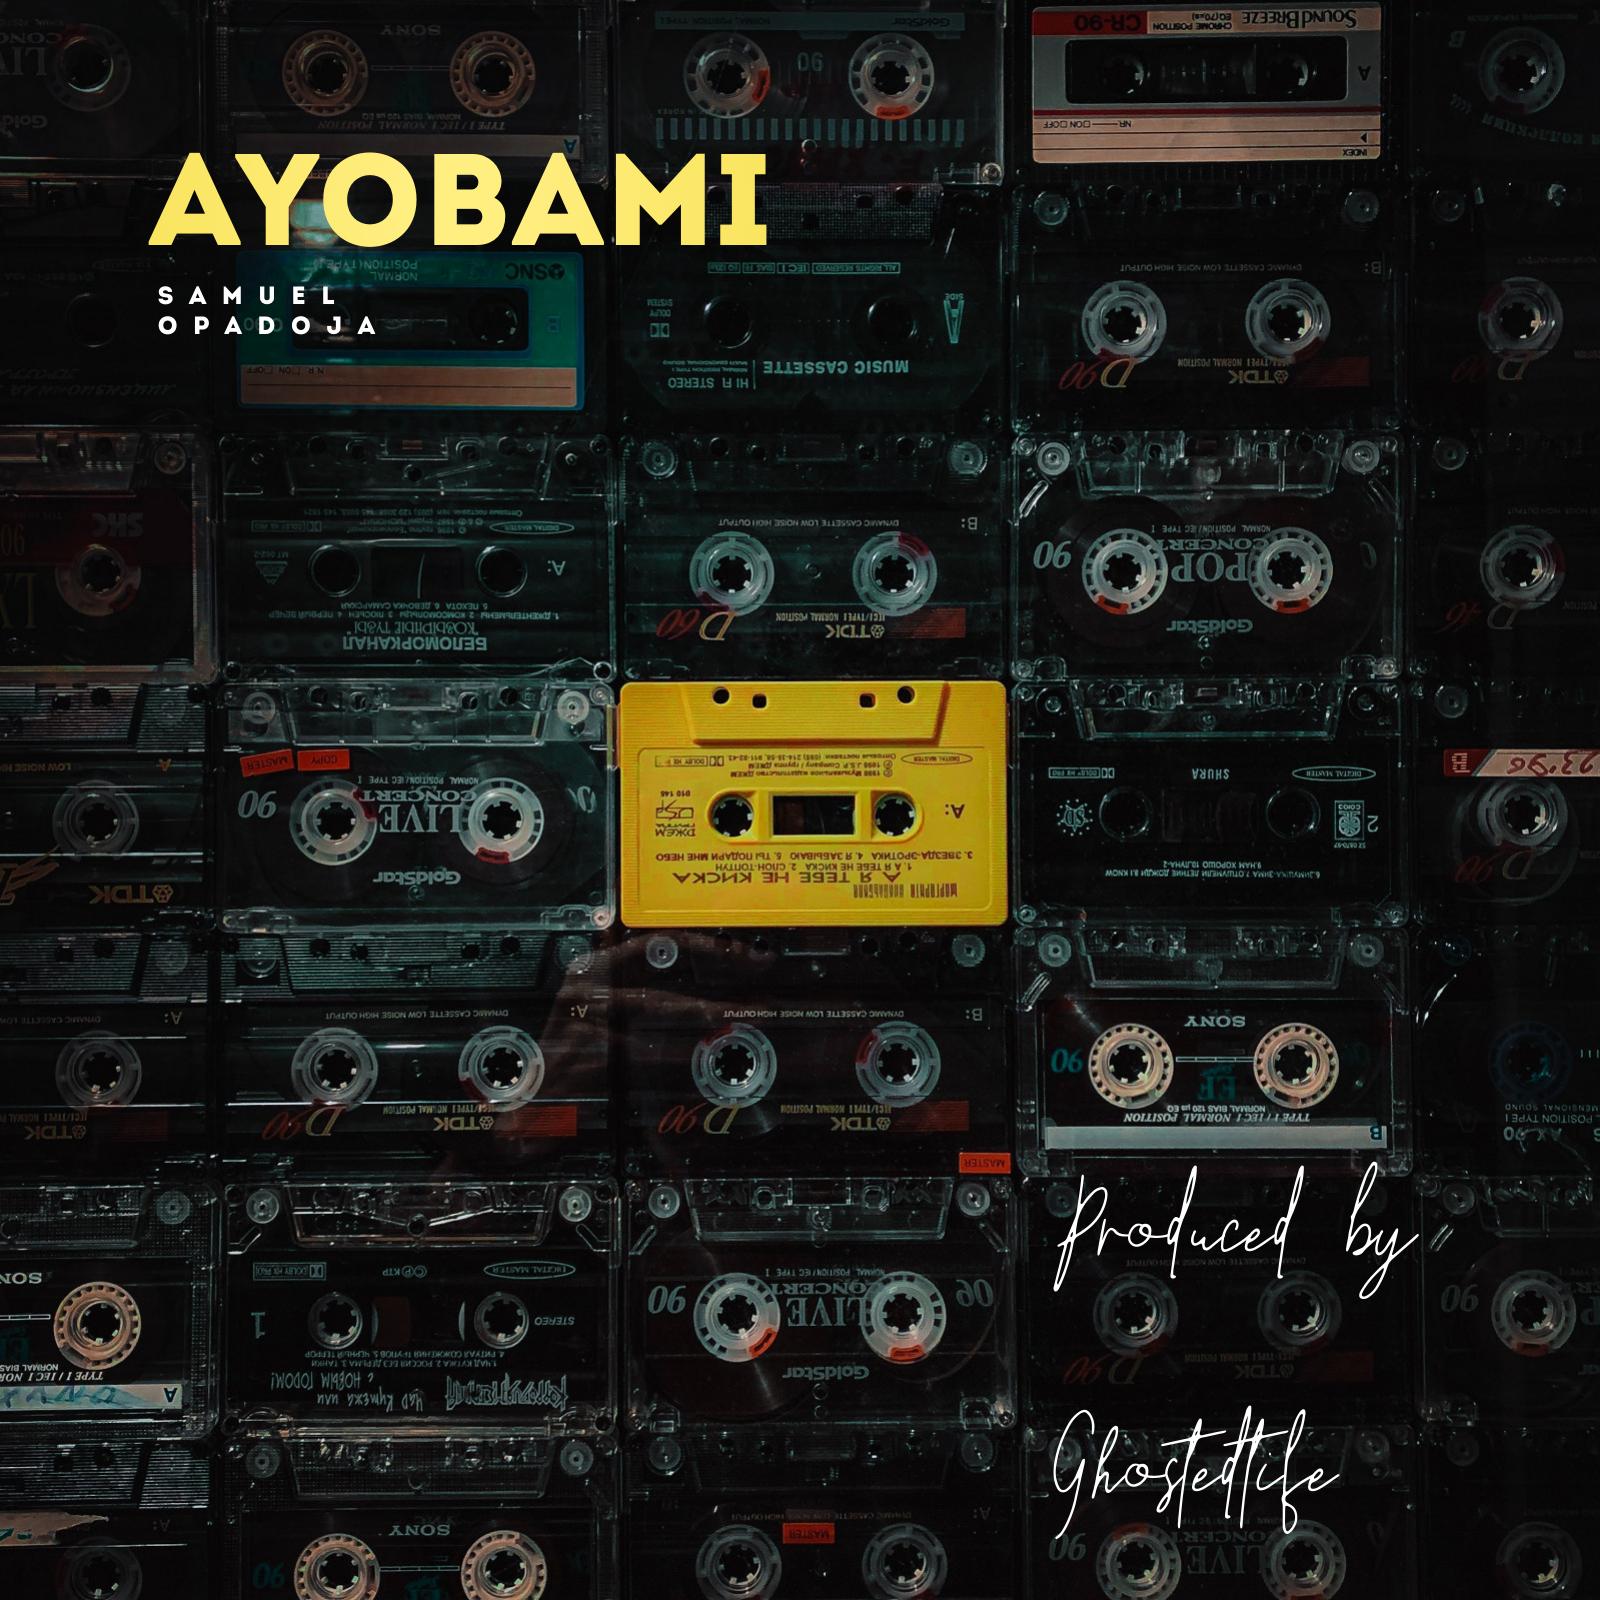 AYOBAMI - Samuel Opadoja